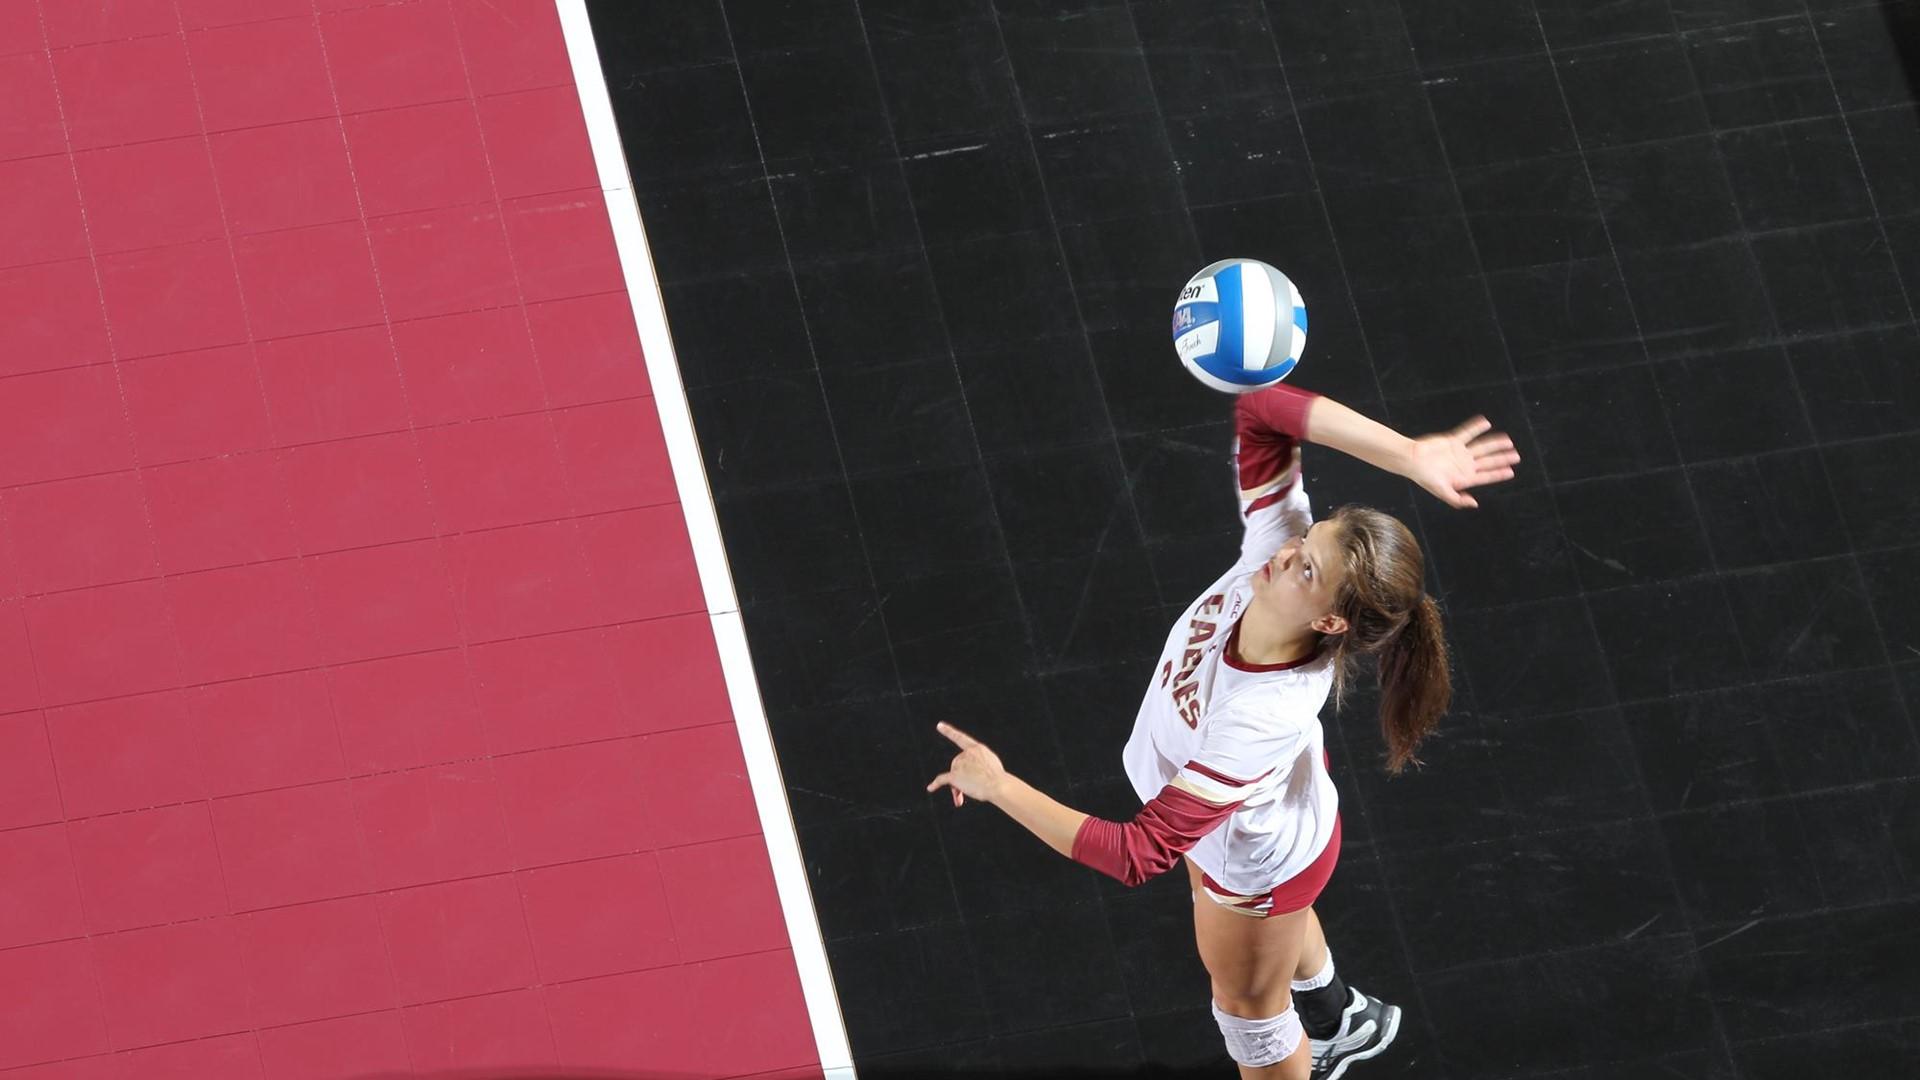 bc volleyball bceagles.com katty